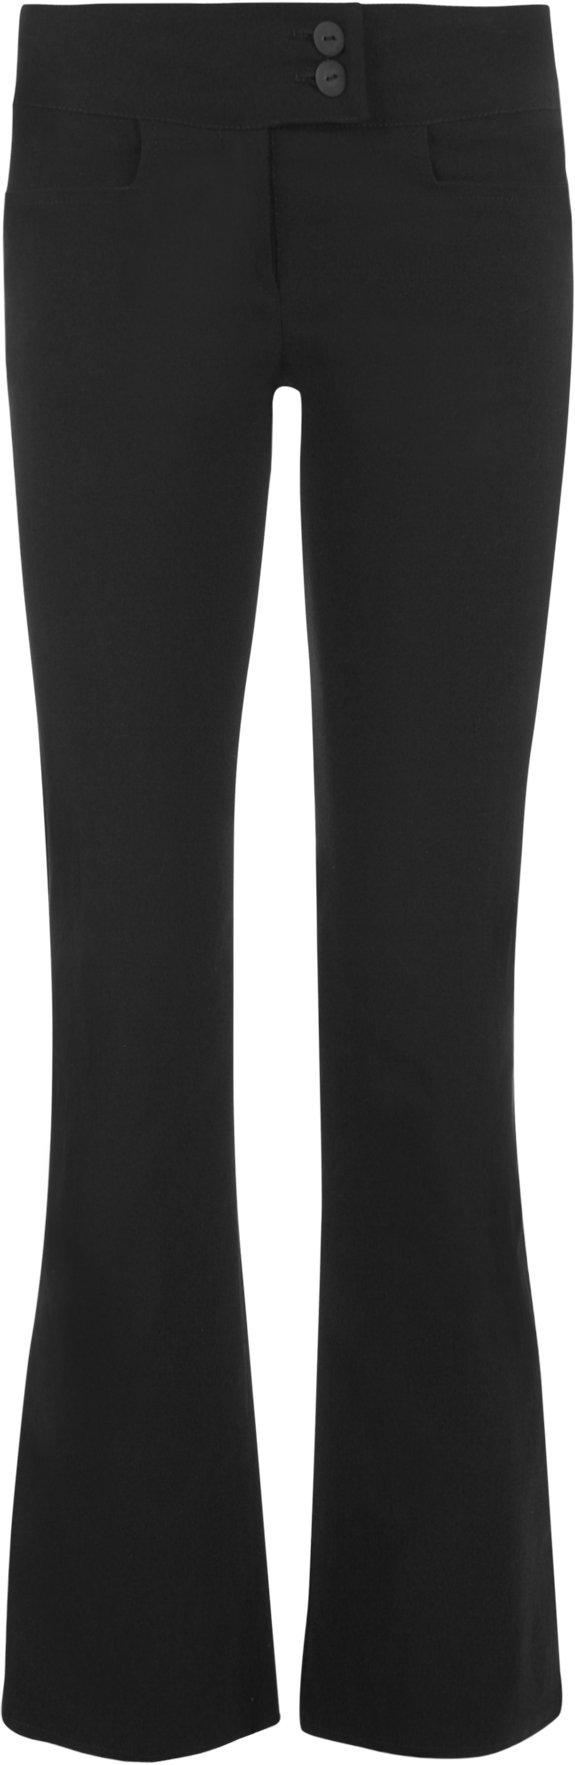 WearAll Women's Black Stretch Hipster Pants - Bootcut 2 Button - Size US 8 (UK 12) Inside Leg 33''